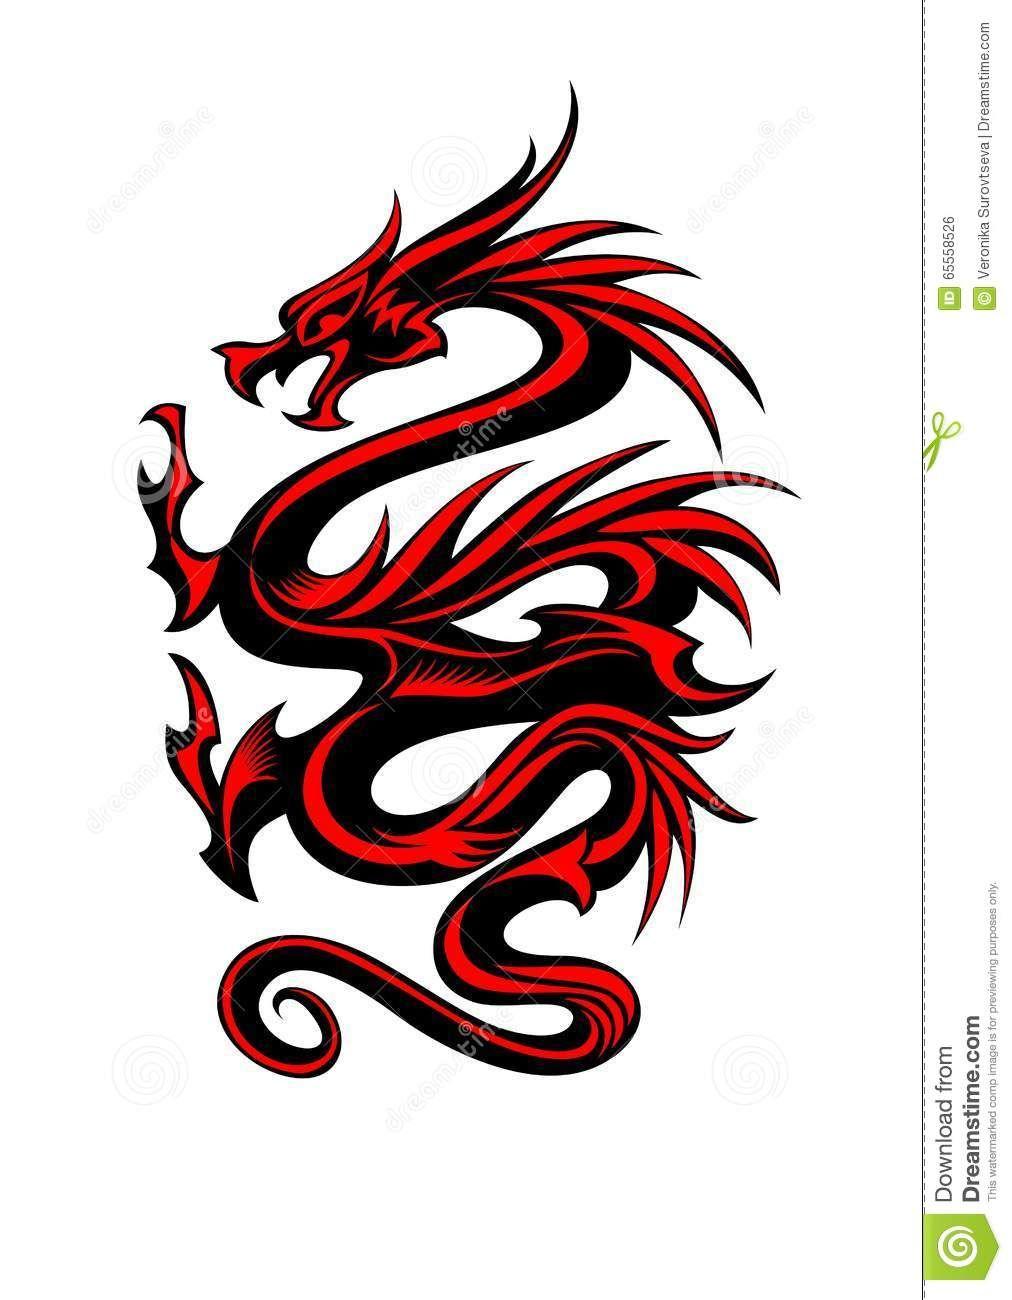 Amazing Red Dragon Tribal Tattoo Design Dragoon In 2018 Pinterest